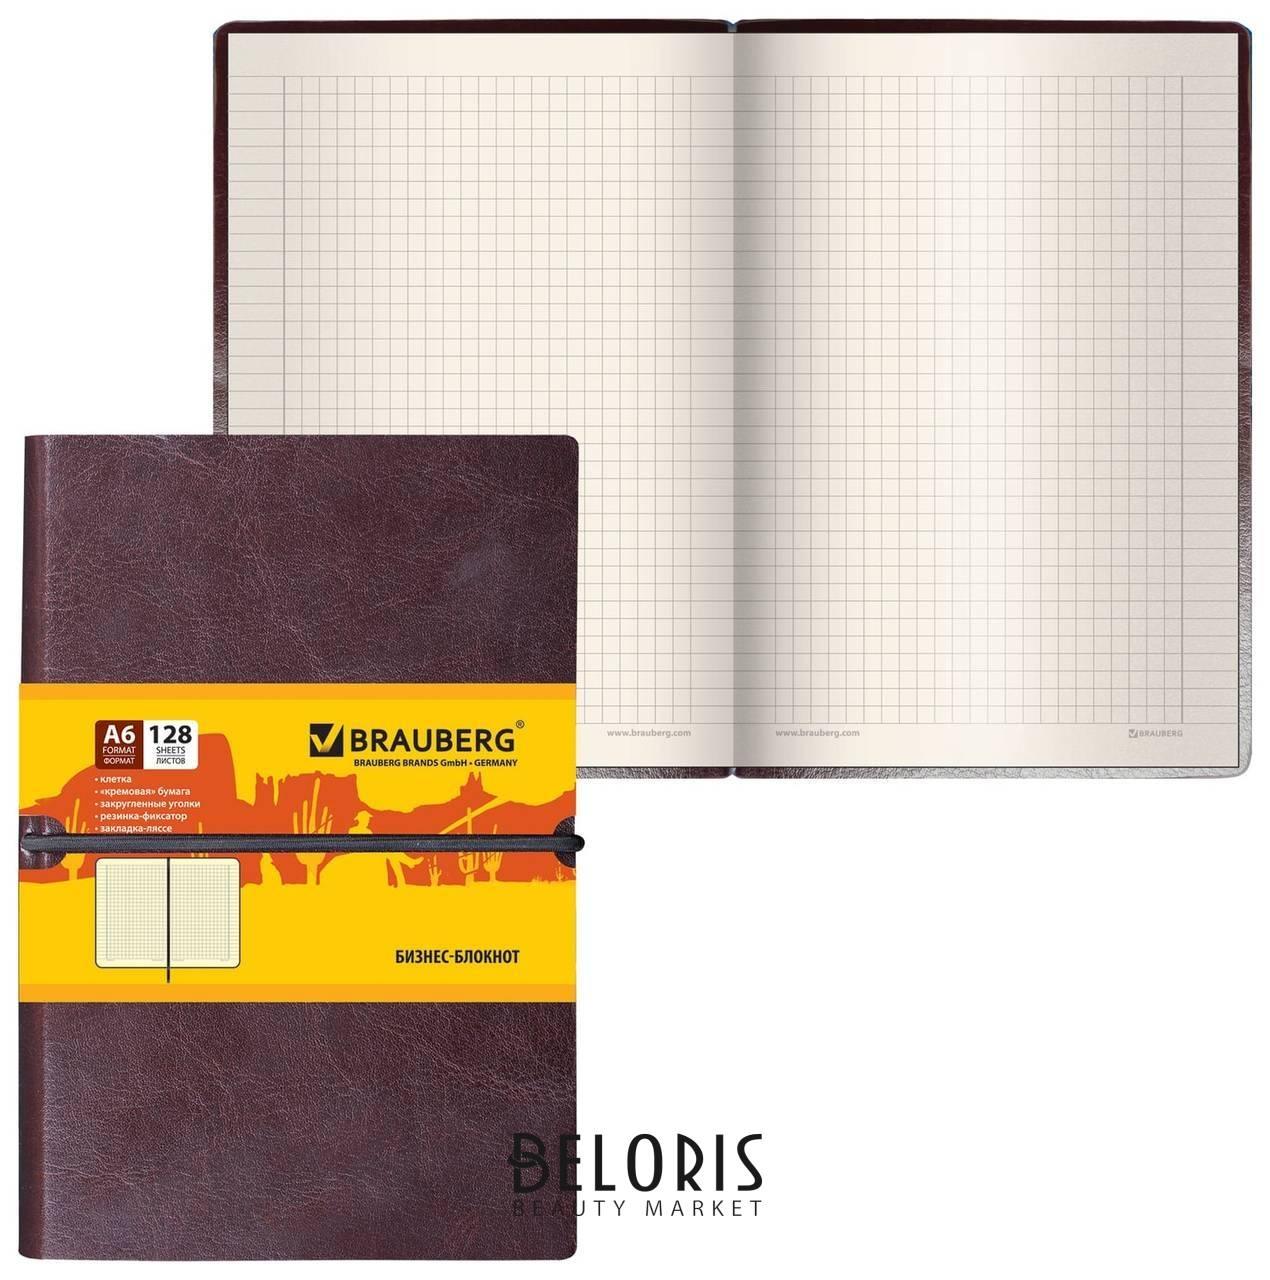 Блокнот малый формат (100х150 мм) А6, Western, 128 л., гладкий кожзам, резинка, клетка, коричневый Brauberg